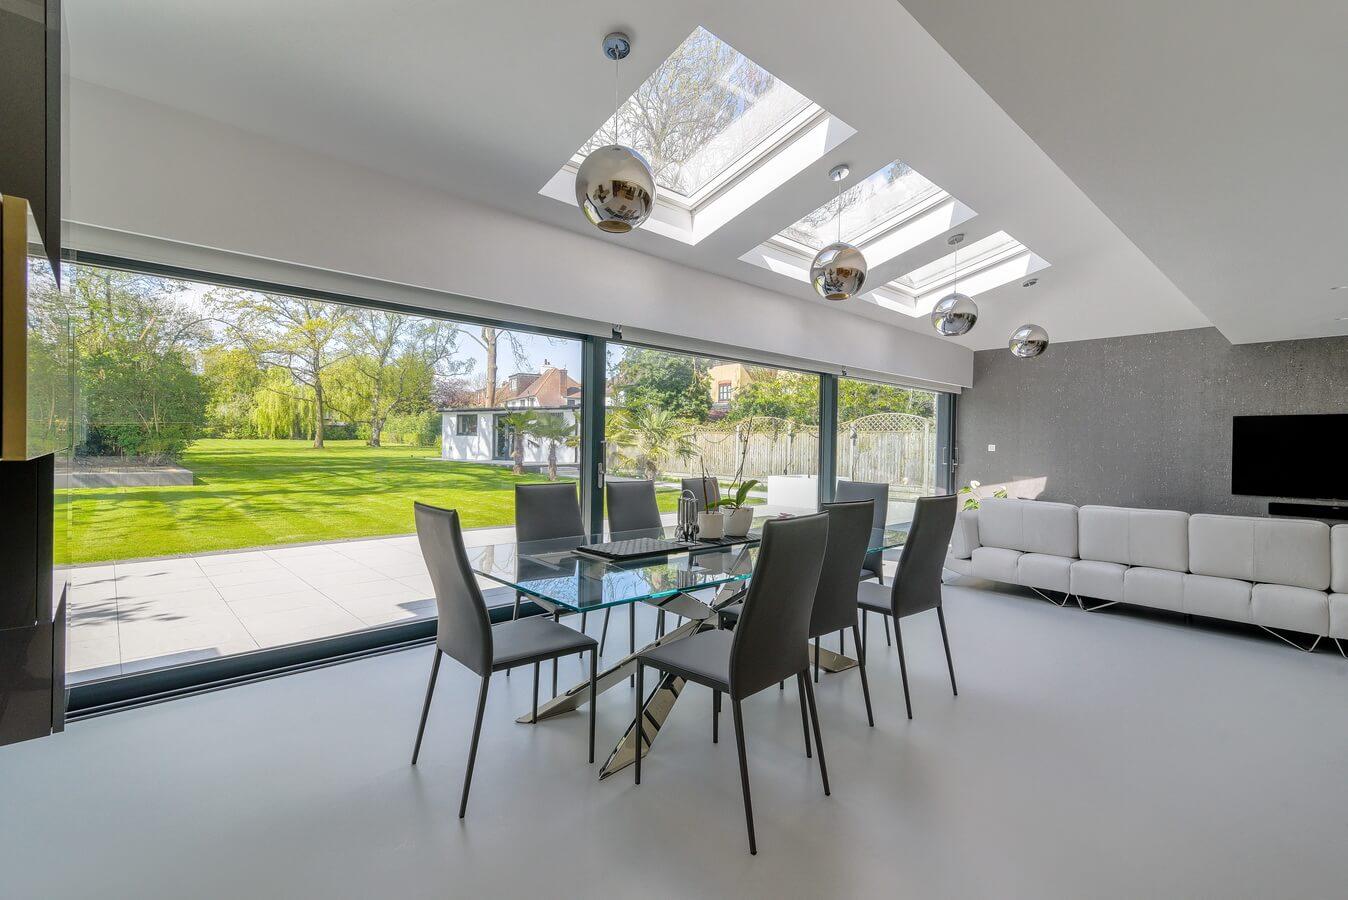 pinner-luxury-kitchen-extension.jpg